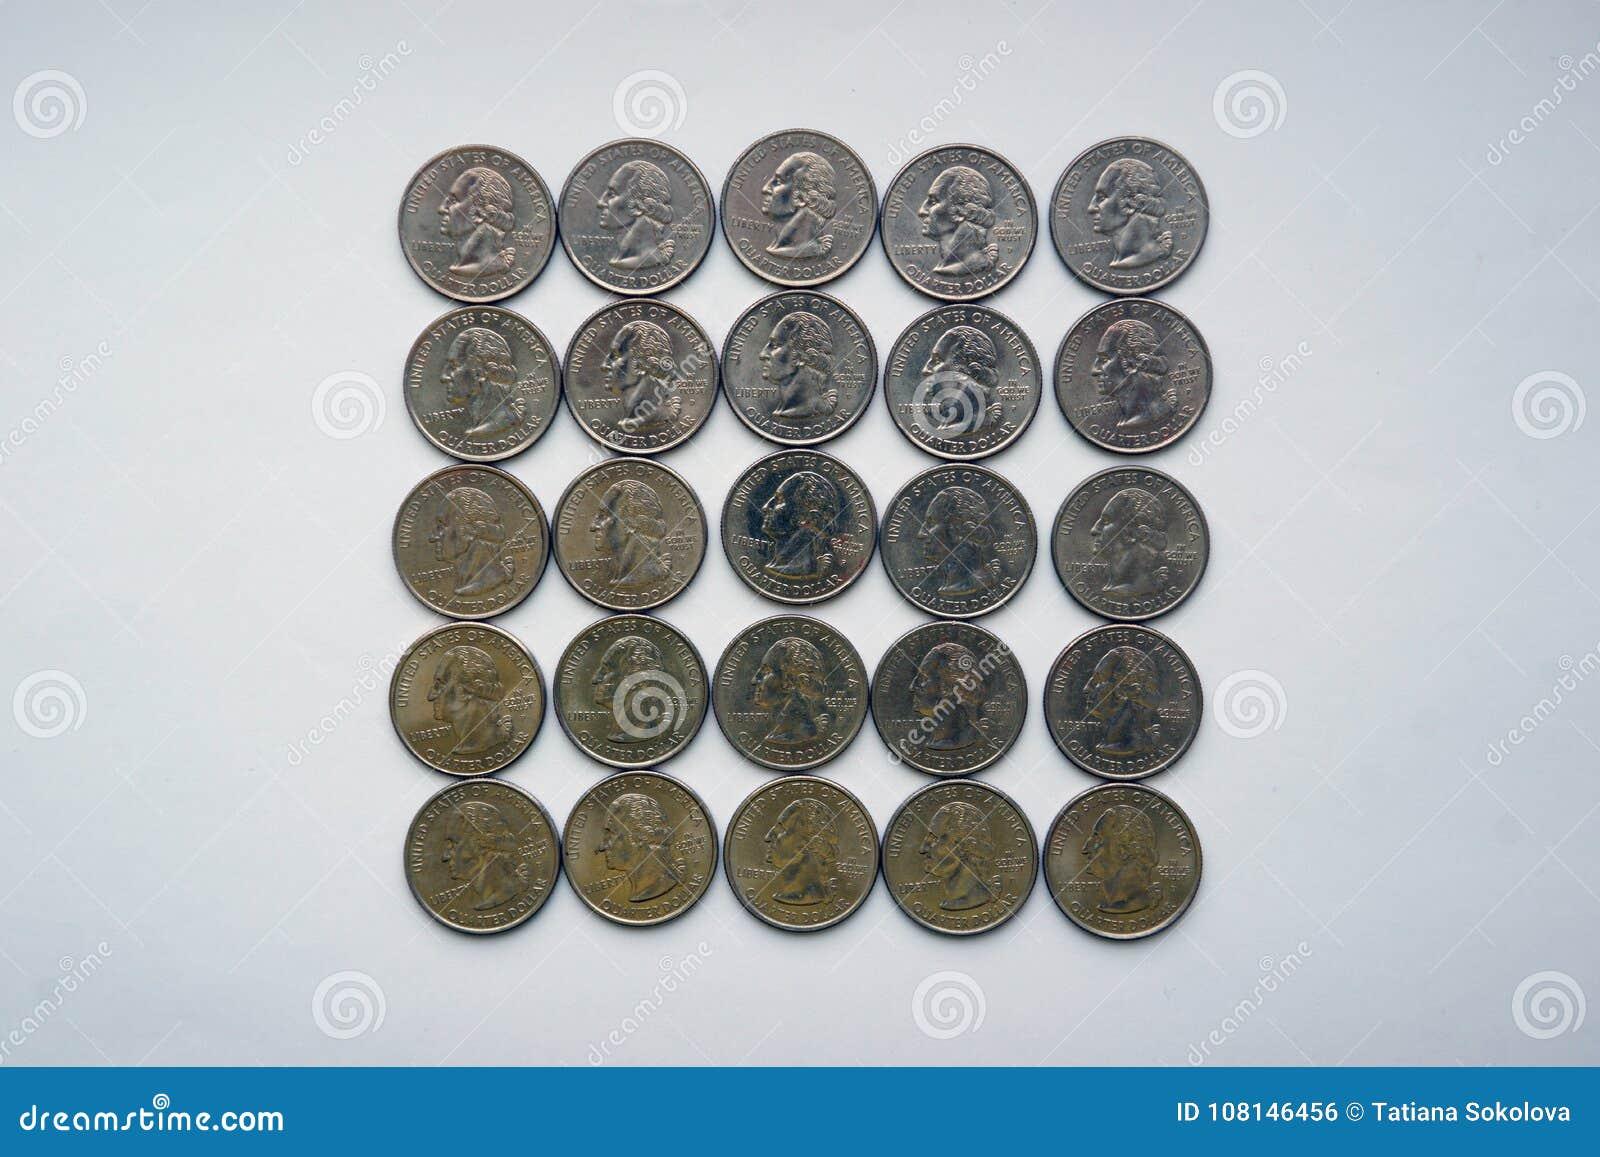 Square of `Washington Quarter` - quarter dollar.